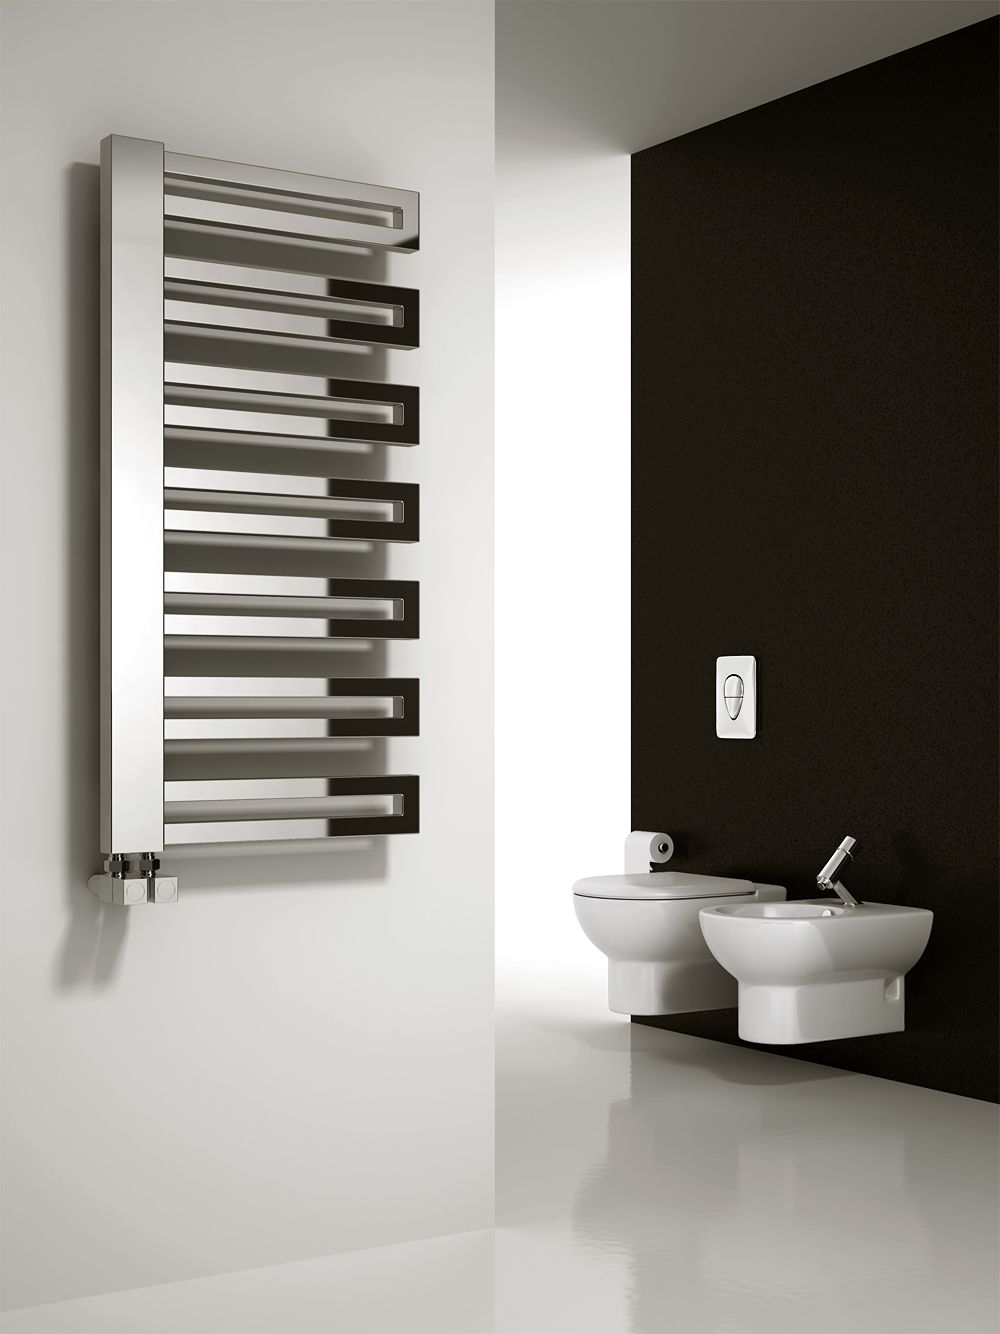 Reina Ginosa Towel Radiator,Modern Towel Radiators  Heated towel